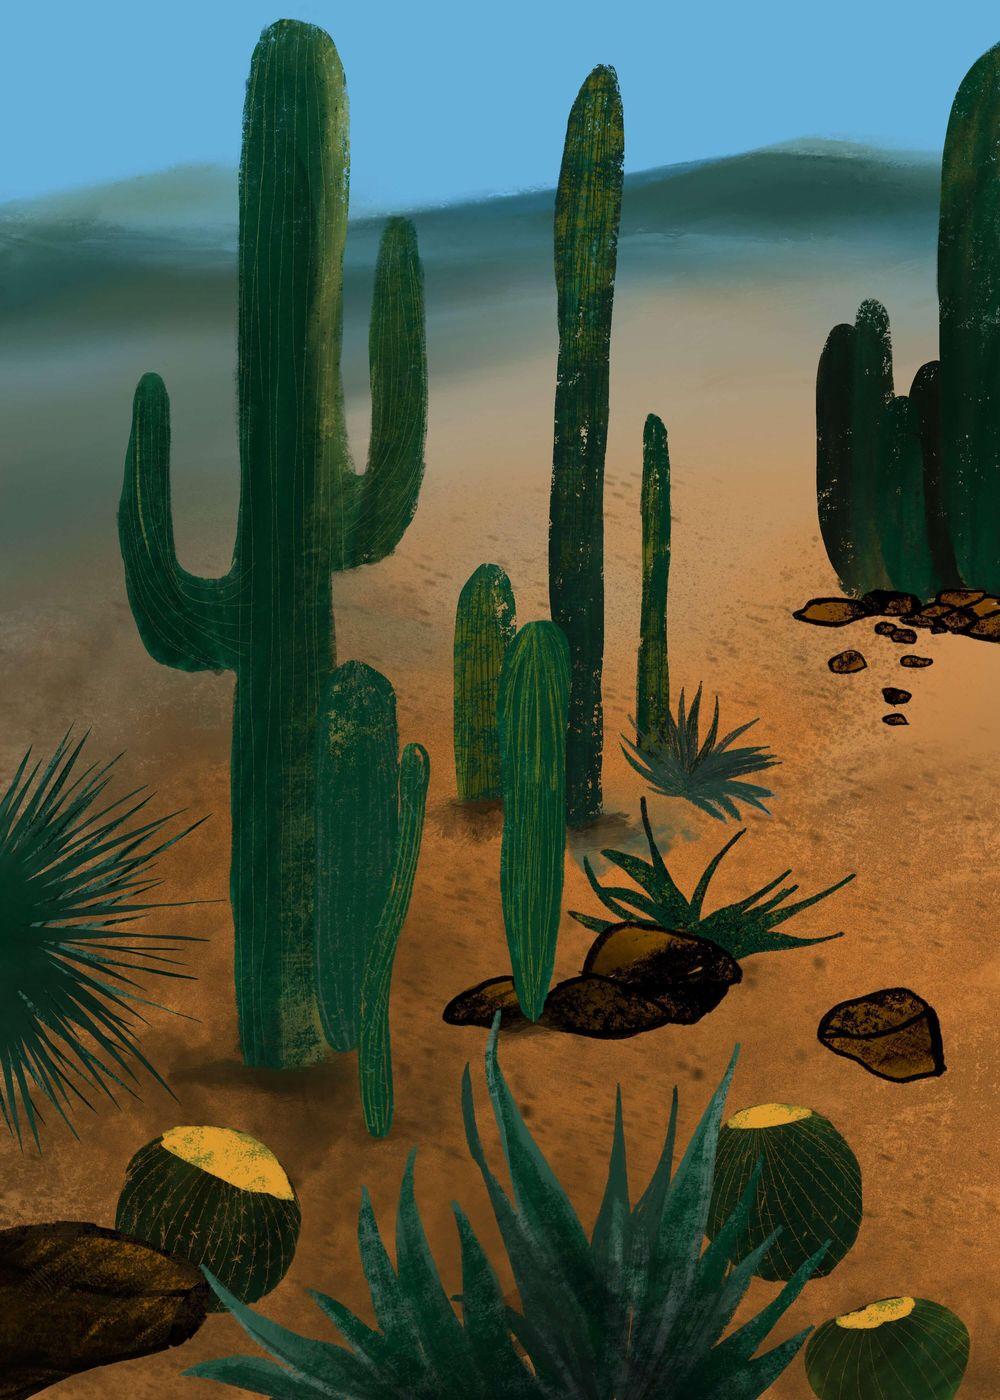 Desert Cactus - image 2 - student project